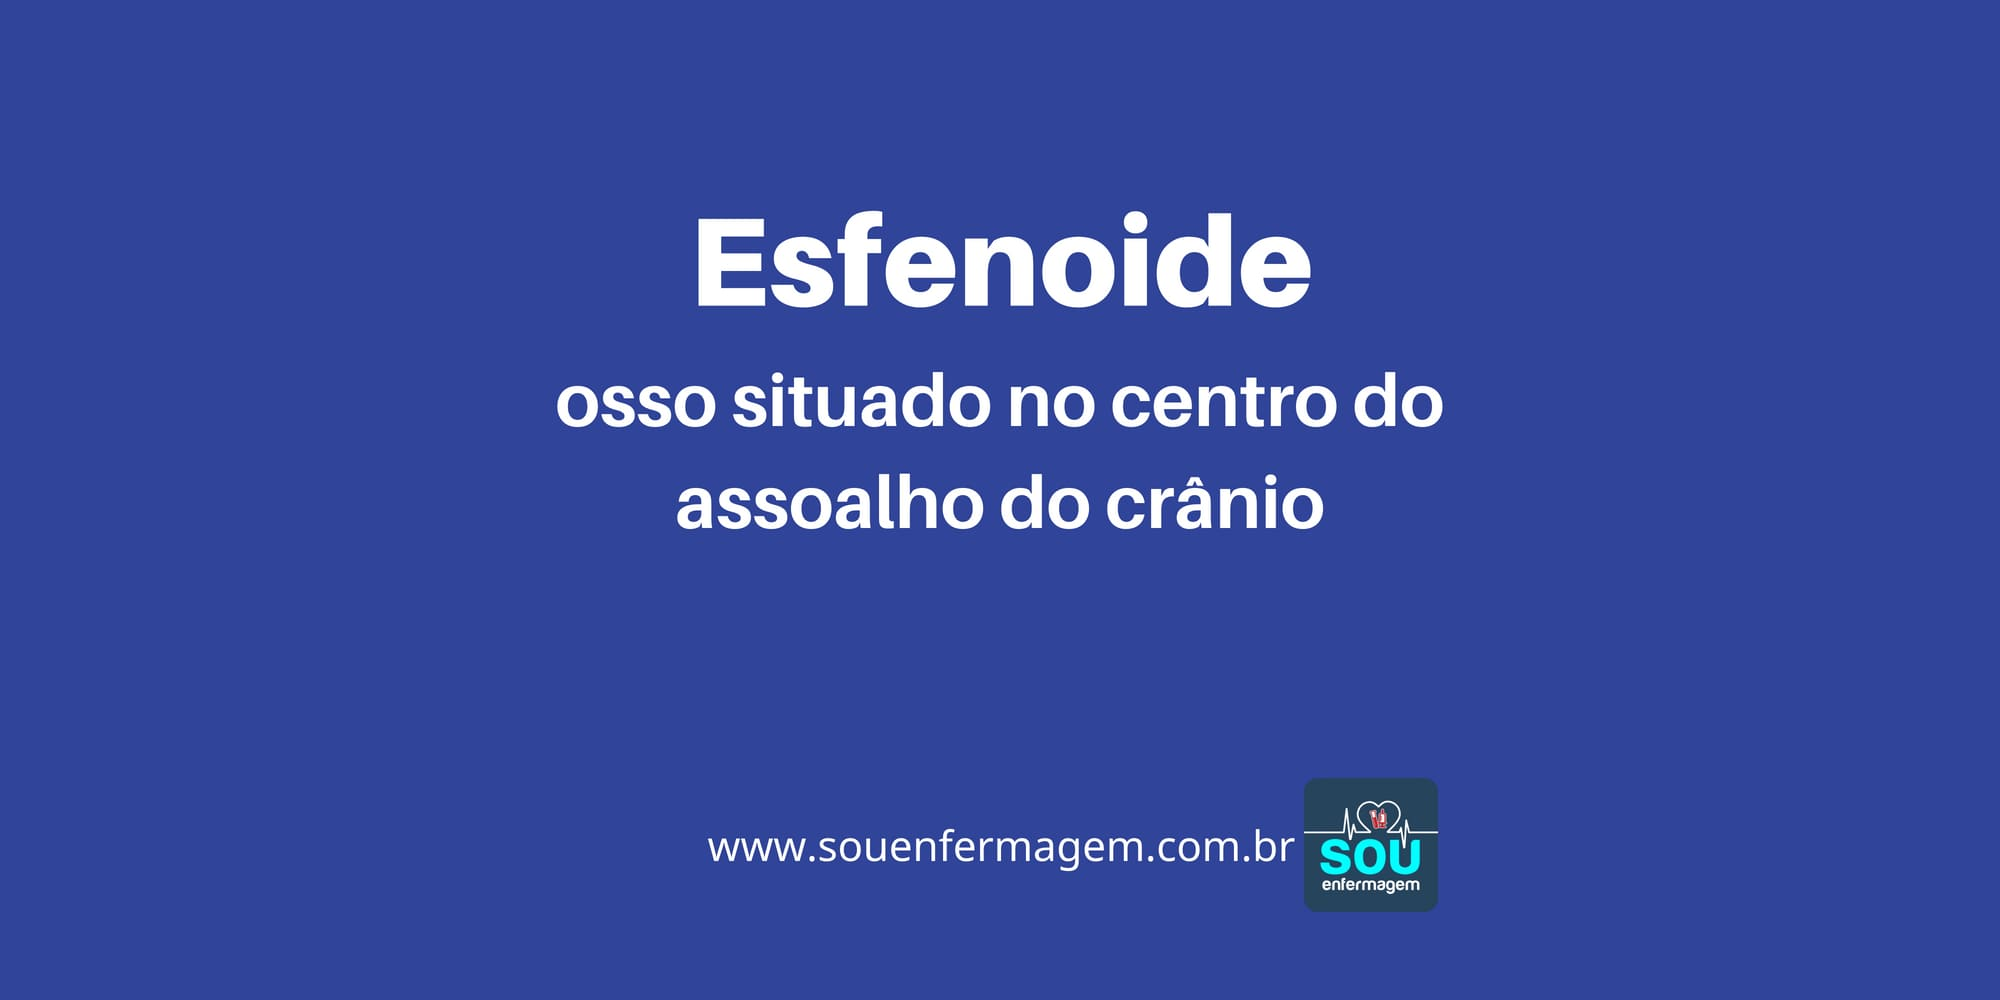 Esfenoide